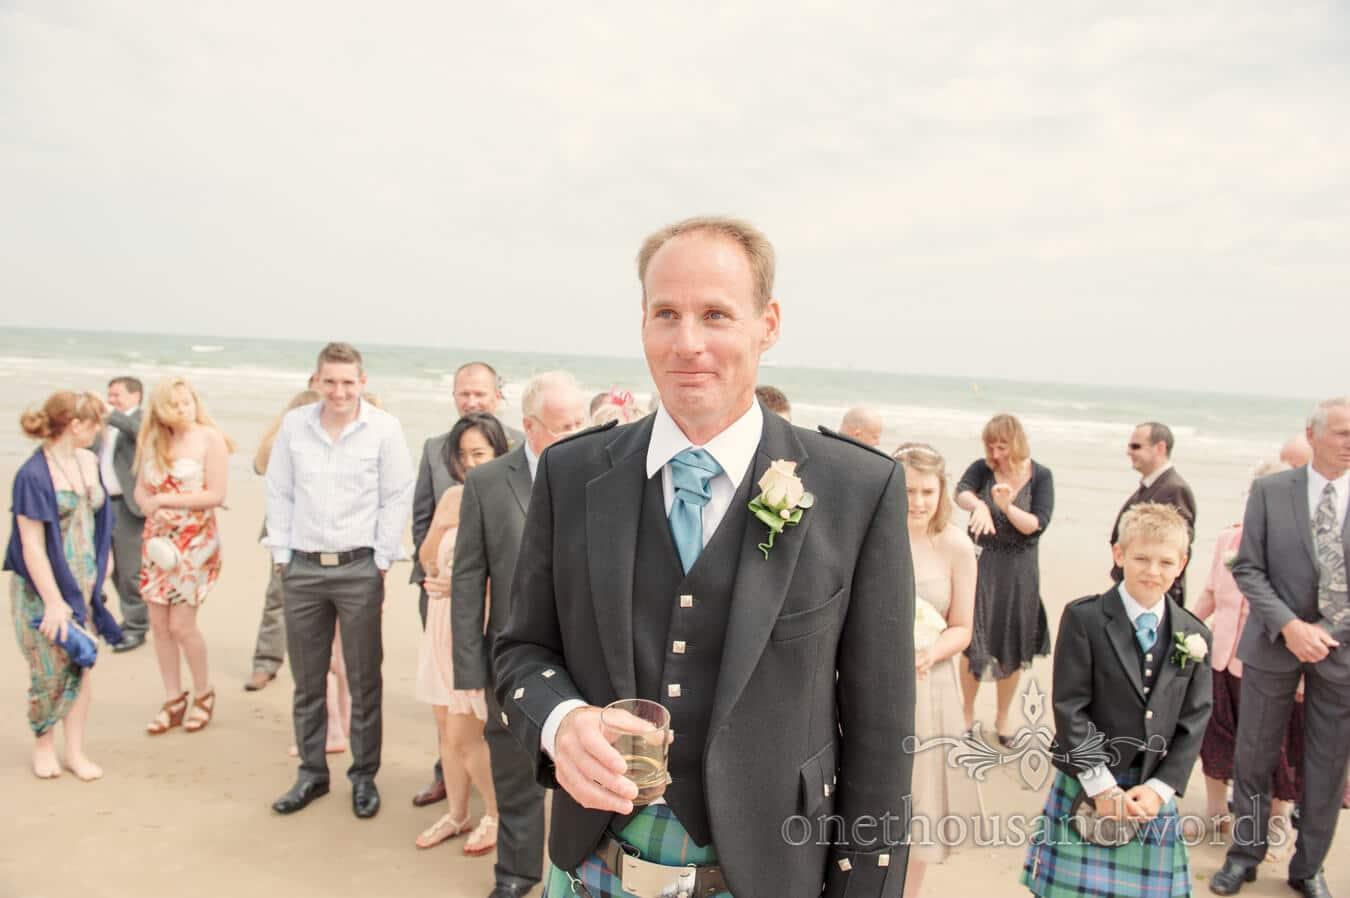 Groom at Sandbanks beach wedding